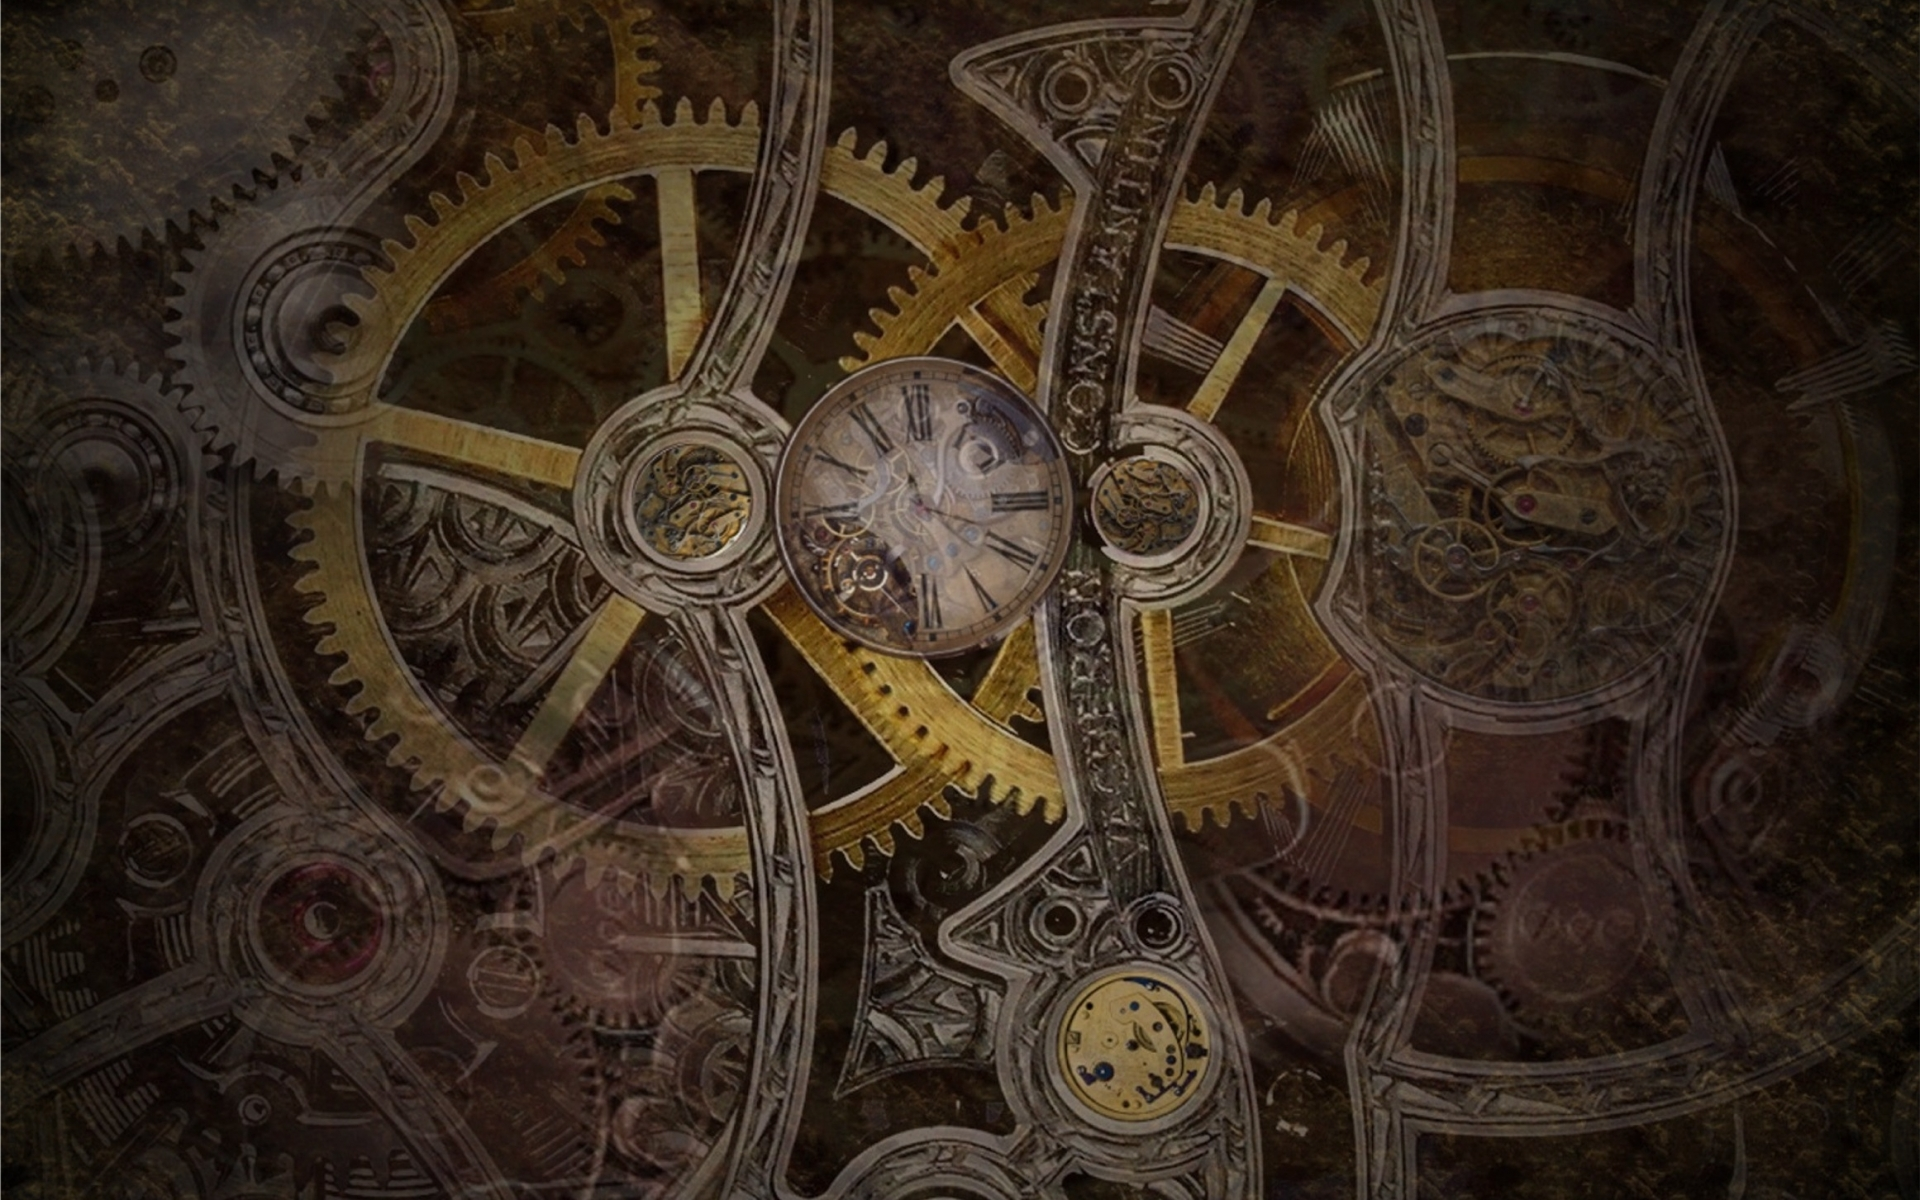 gears wallpaper clocks steampunk - photo #1